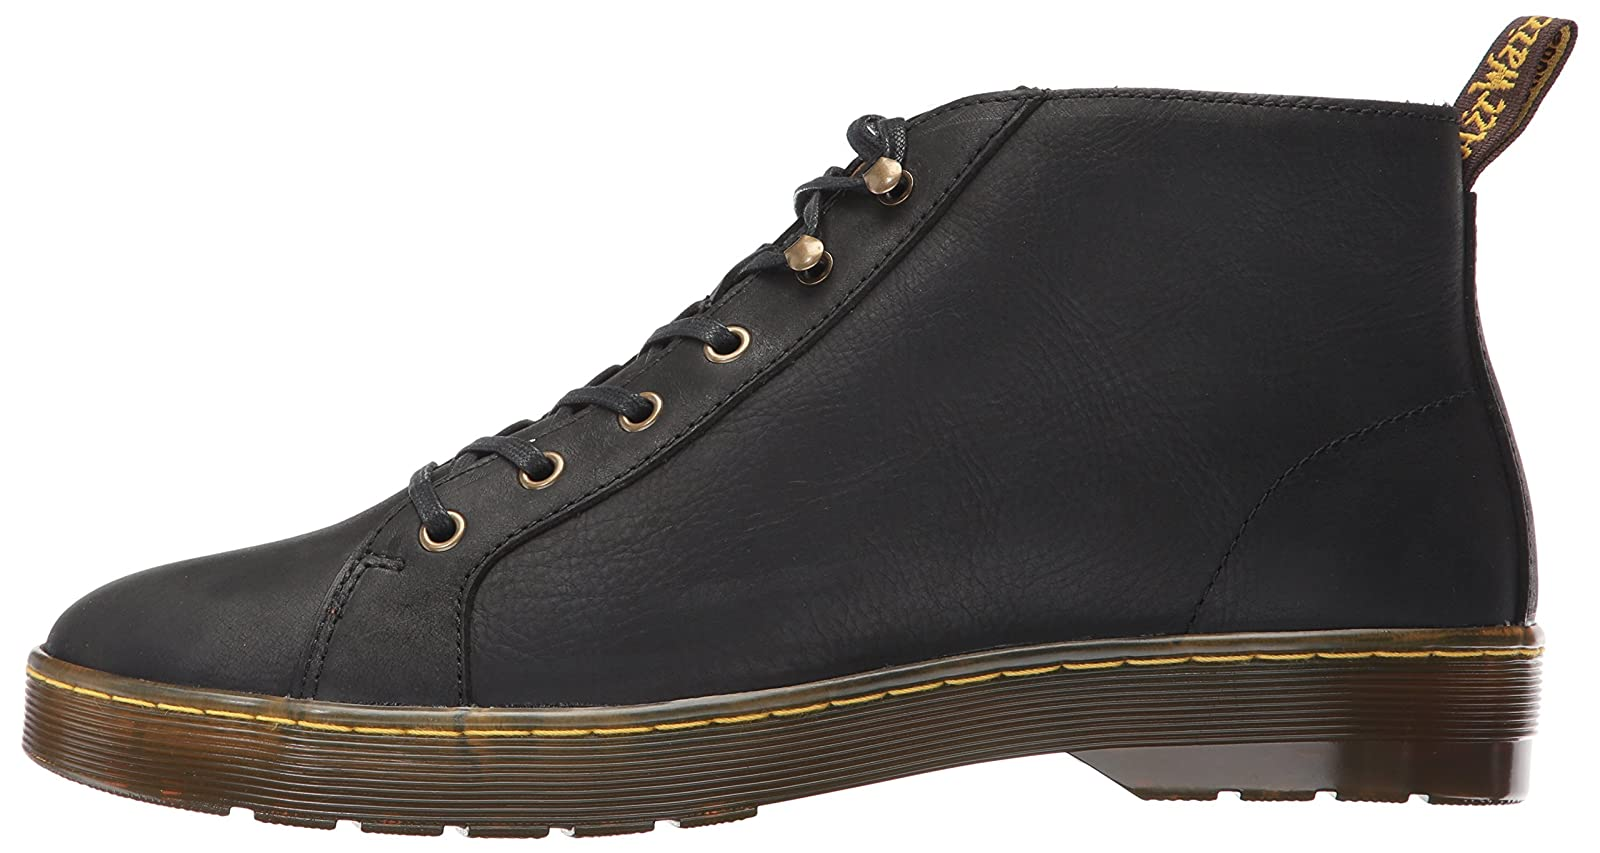 Dr. Martens Men's Coburg Wyoming Chukka Boot 9 M US - 5